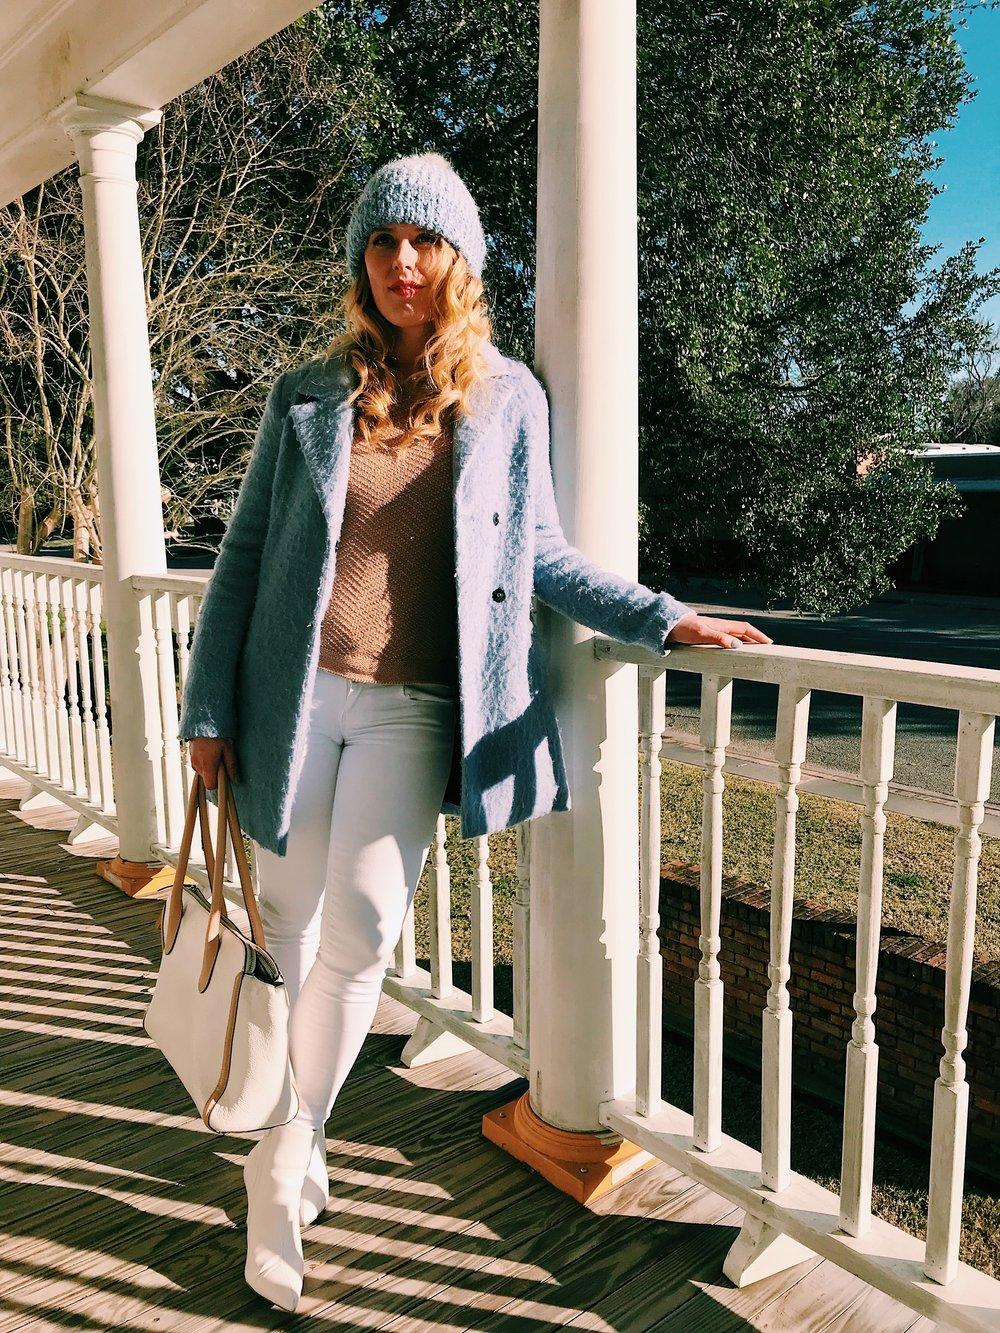 Three Heel Clicks - How to Wear Booties if You're Petite (5).jpg